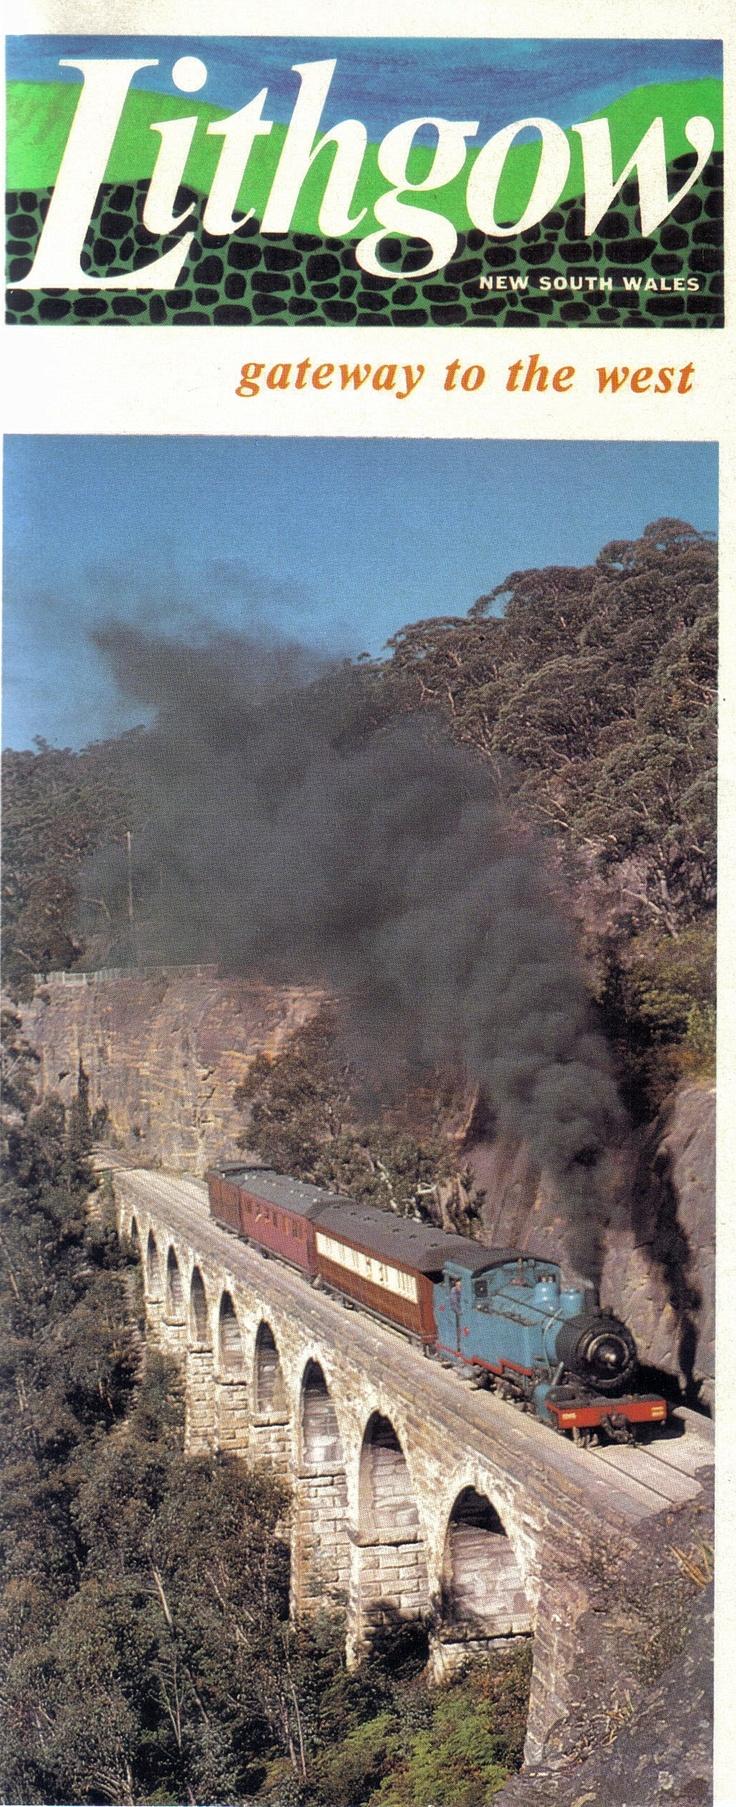 Lithgow railway (1977) @ New South Wales, Australia